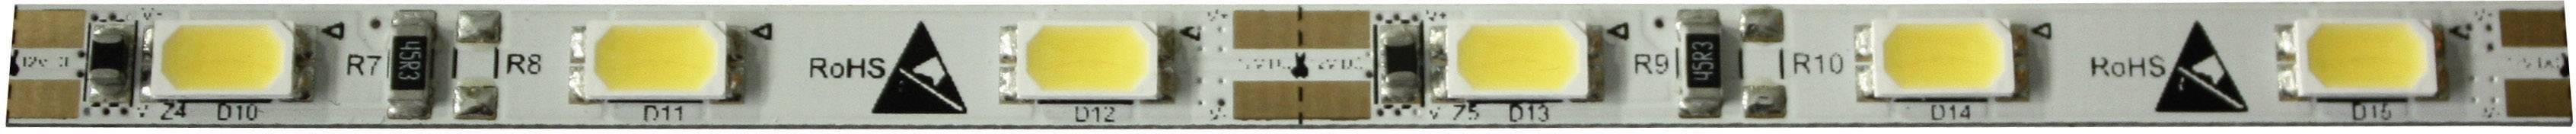 LED pás 12VDC Barthelme 50025633, 50025633, 250 mm, teplá bílá